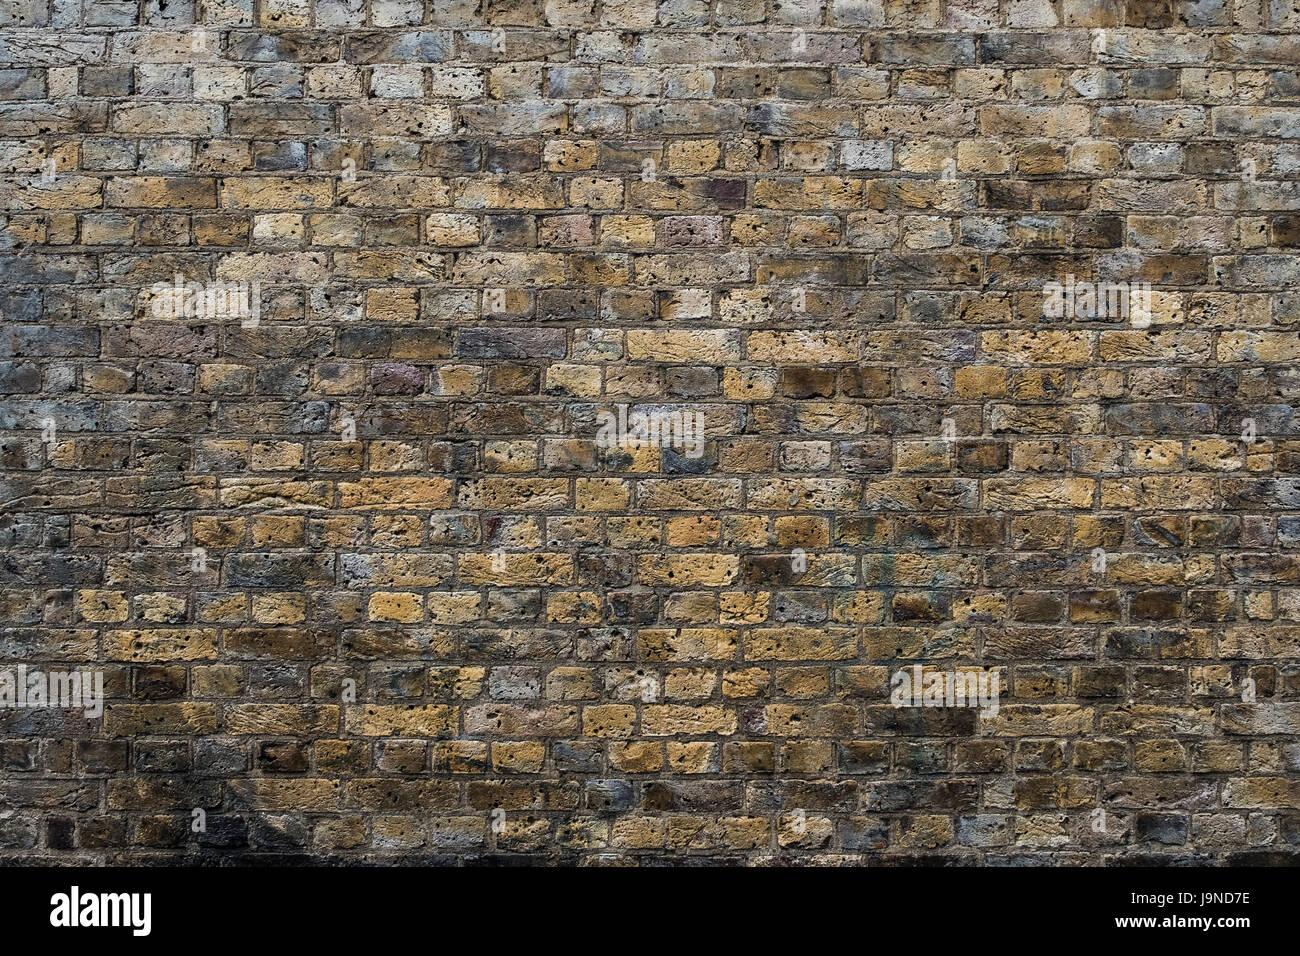 London clay brick background / wallpaper Stock Photo